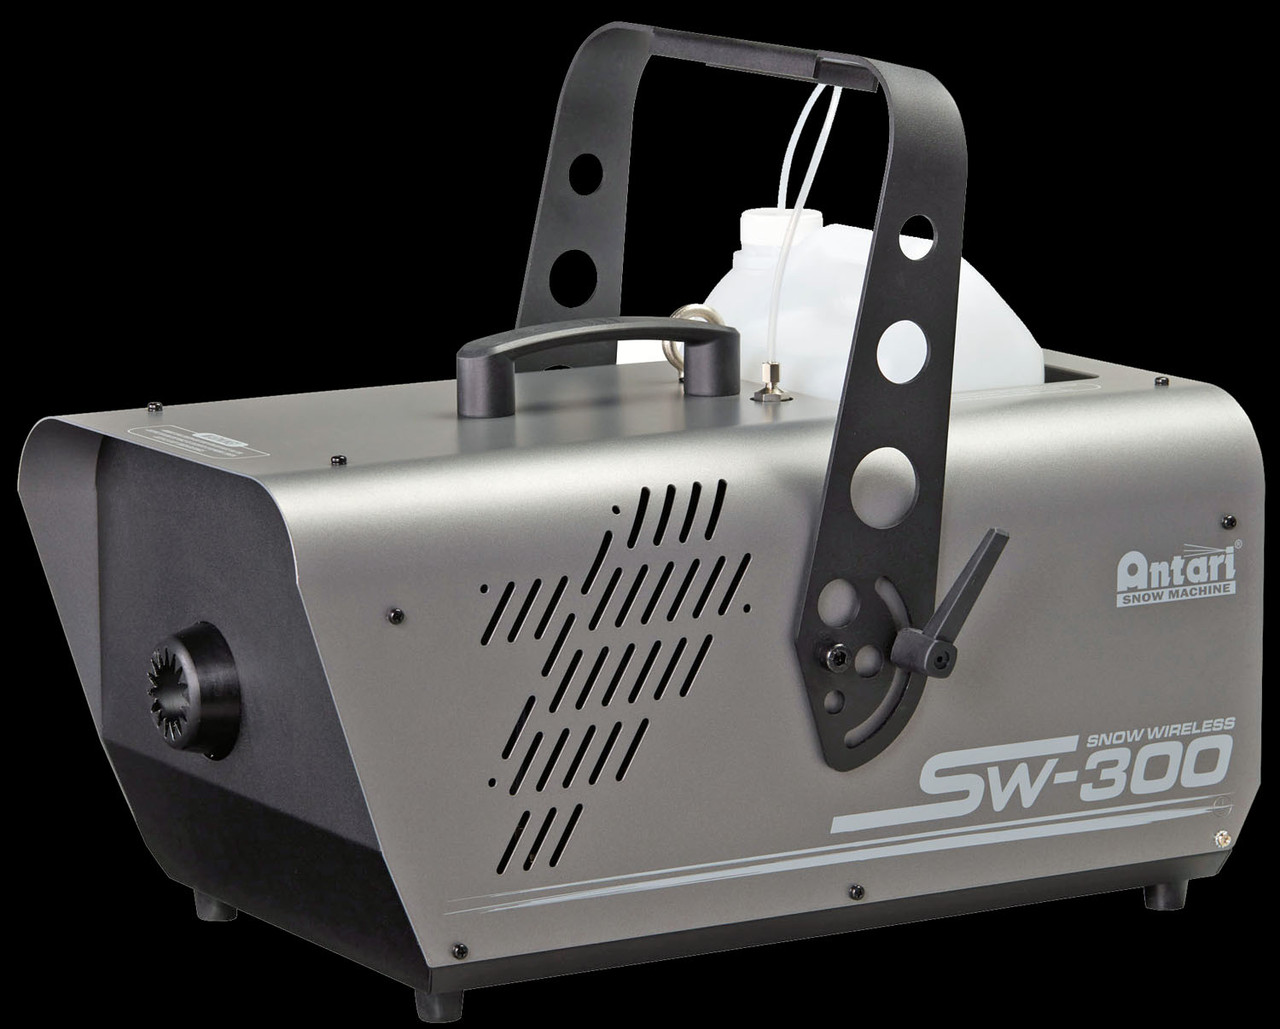 Antari SW-300 High Output / Long Throw Snow Machine